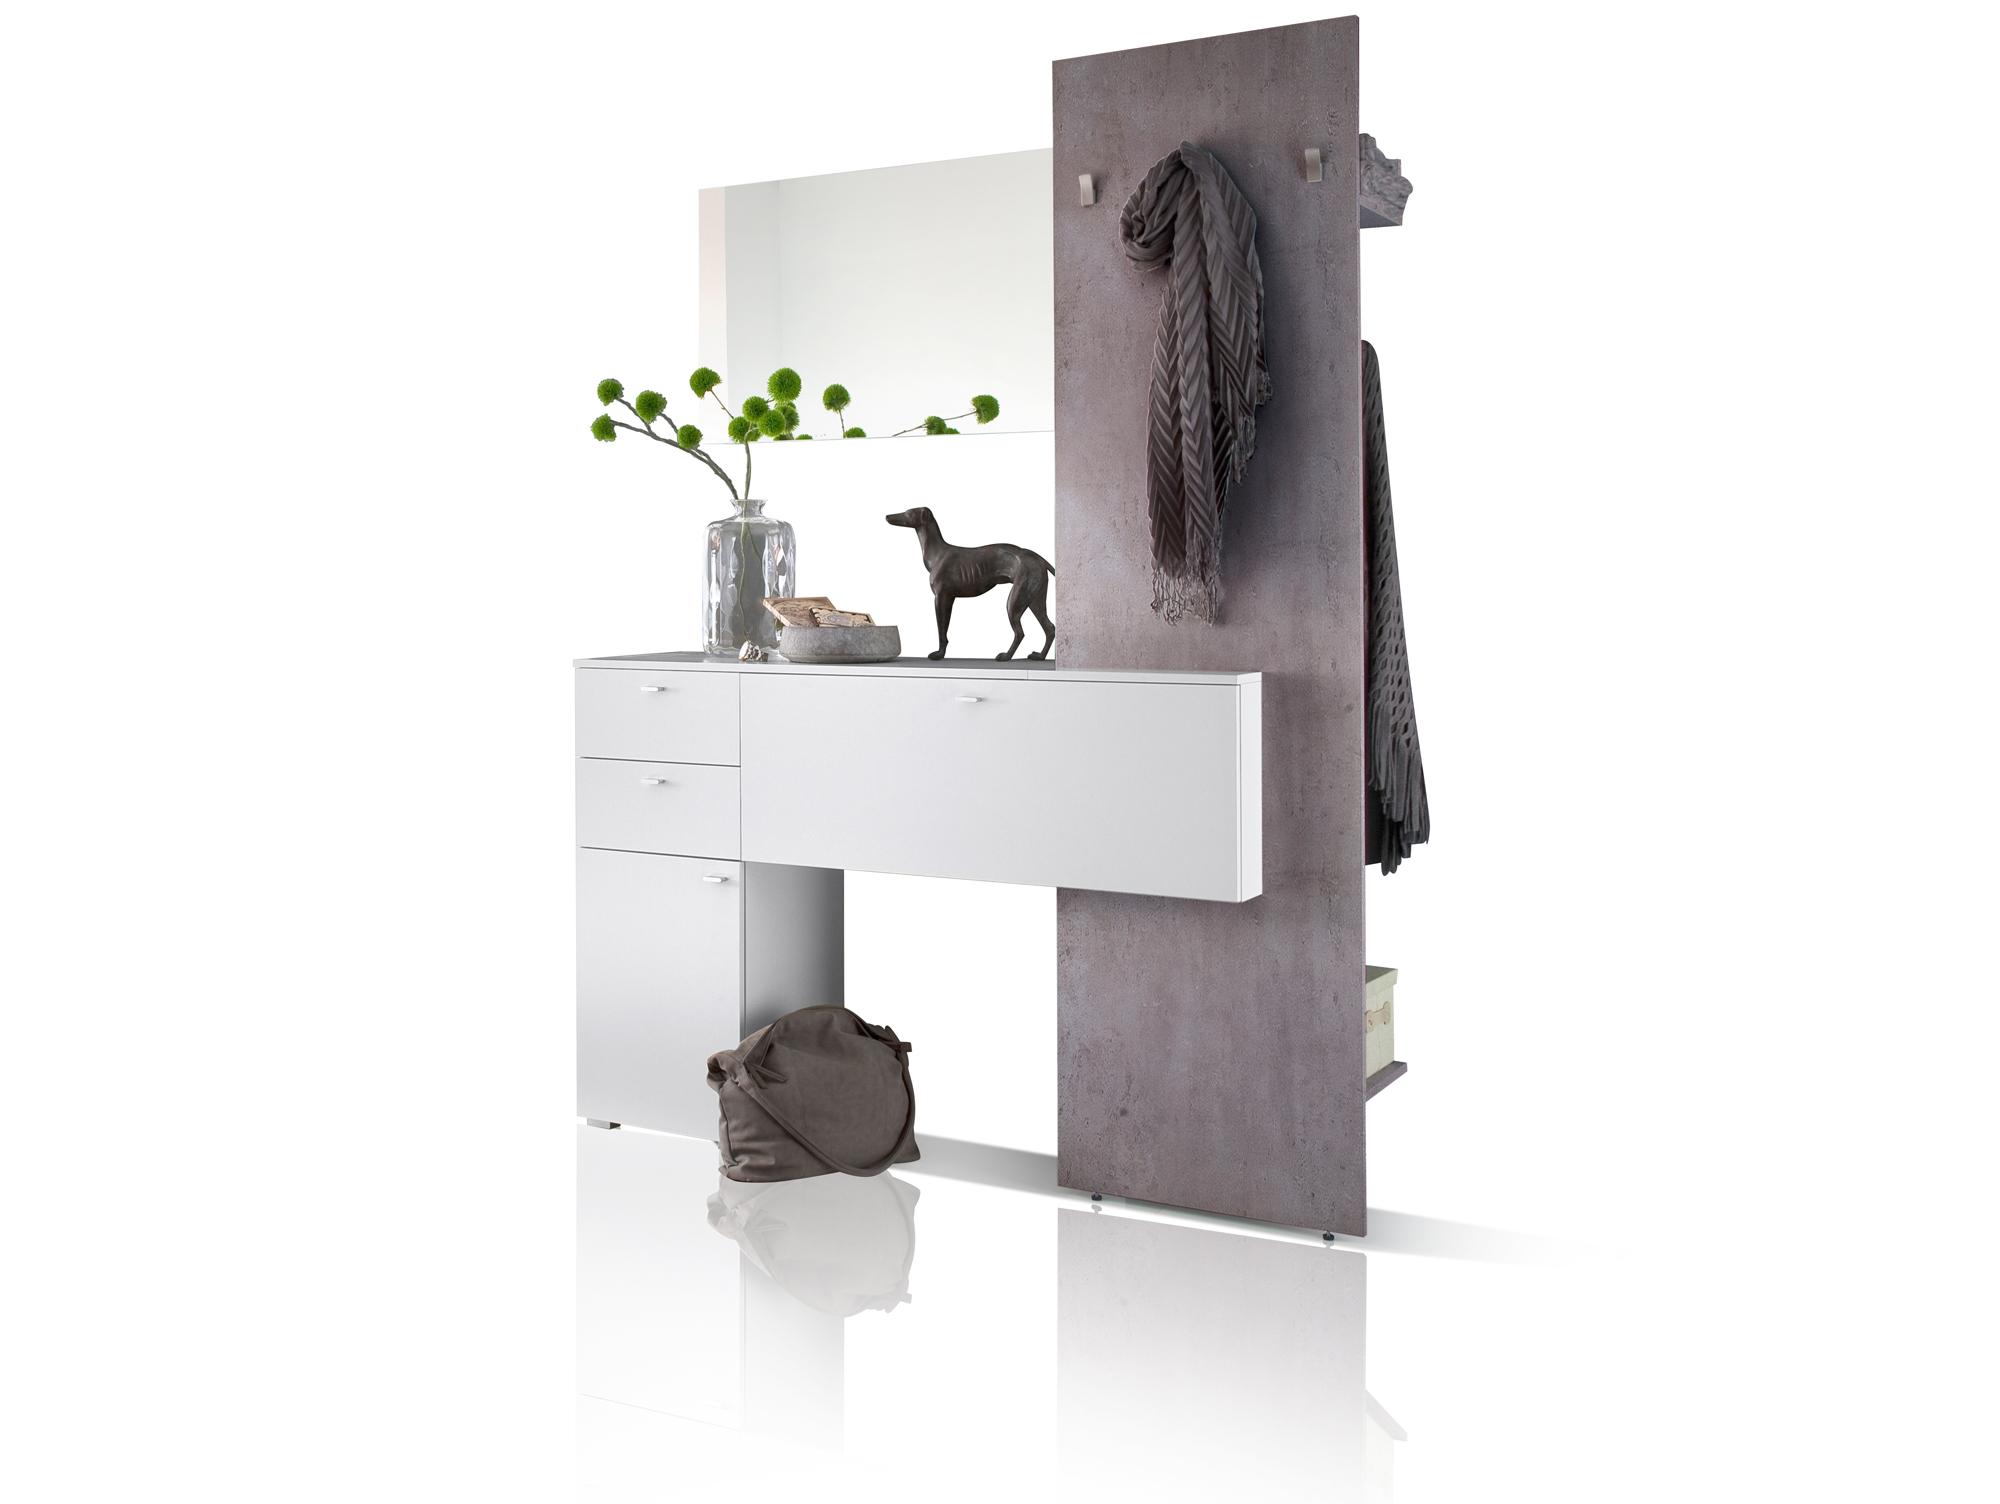 Garderobe betonoptik best garderobe weiss betonoptik for Garderobe komplett programme